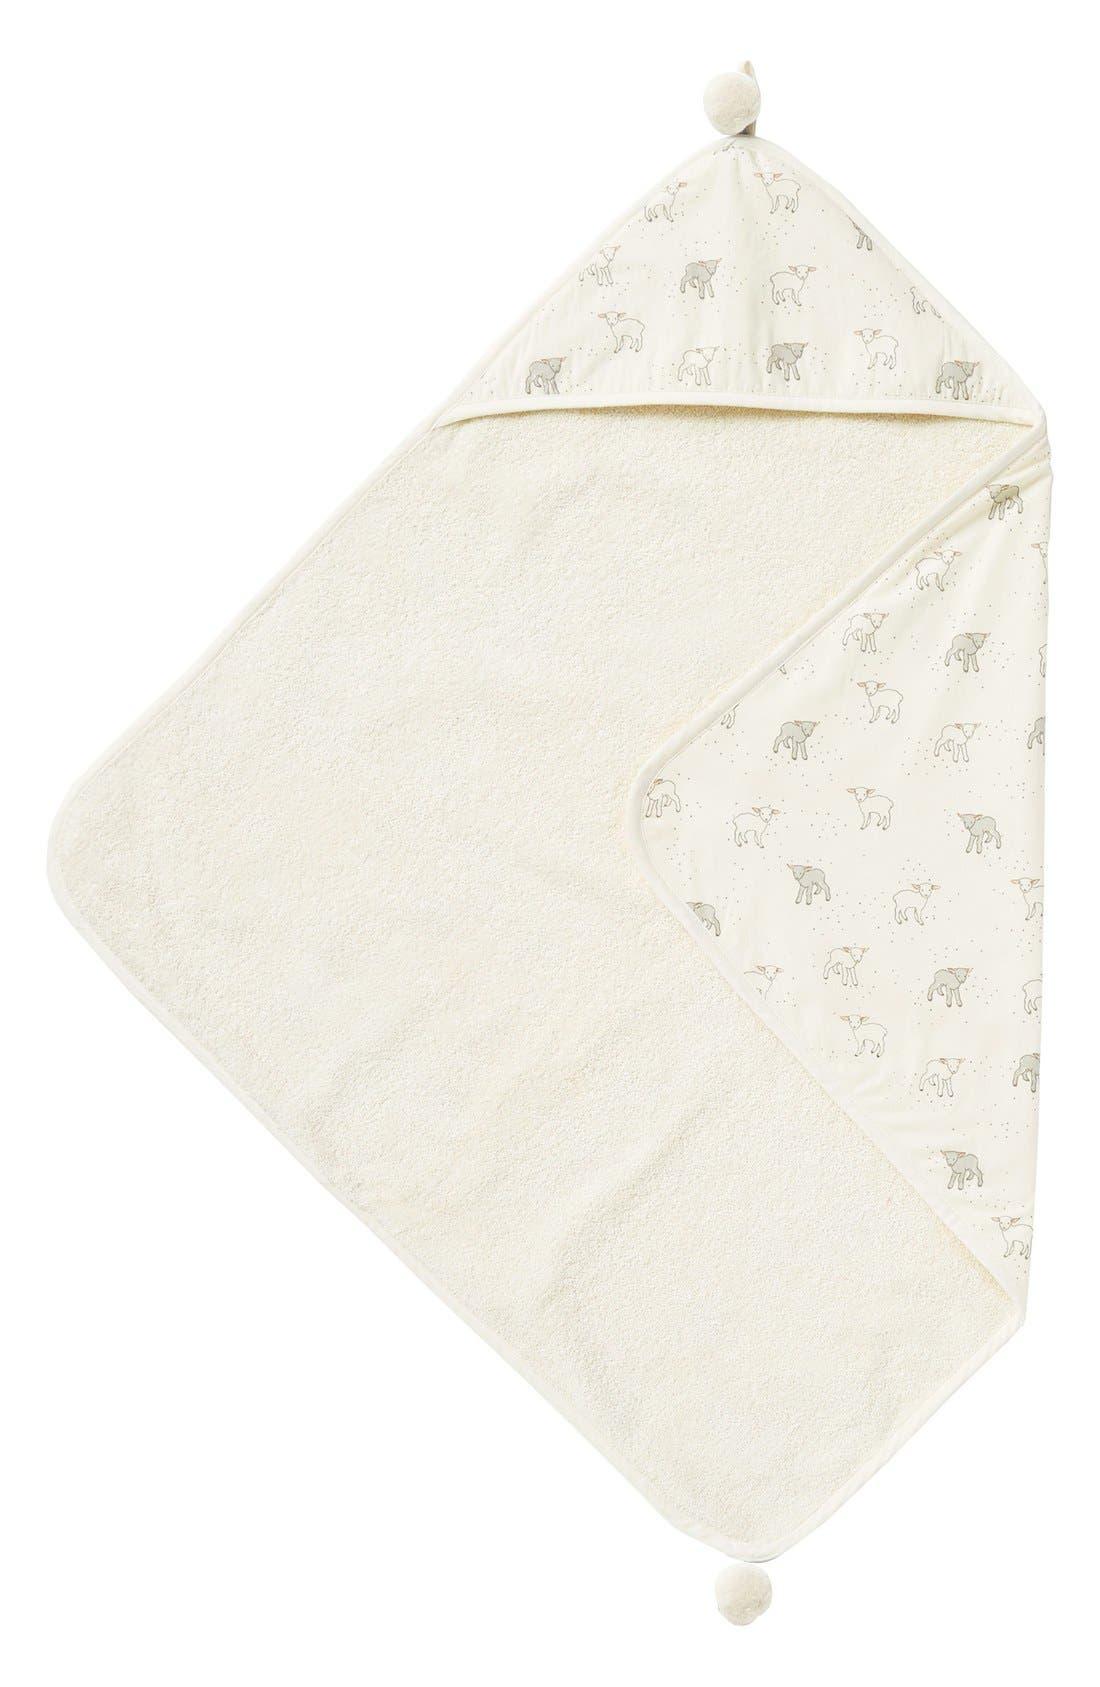 Main Image - Petit Pehr 'Little Lamb' Print Hooded Towel (Baby)